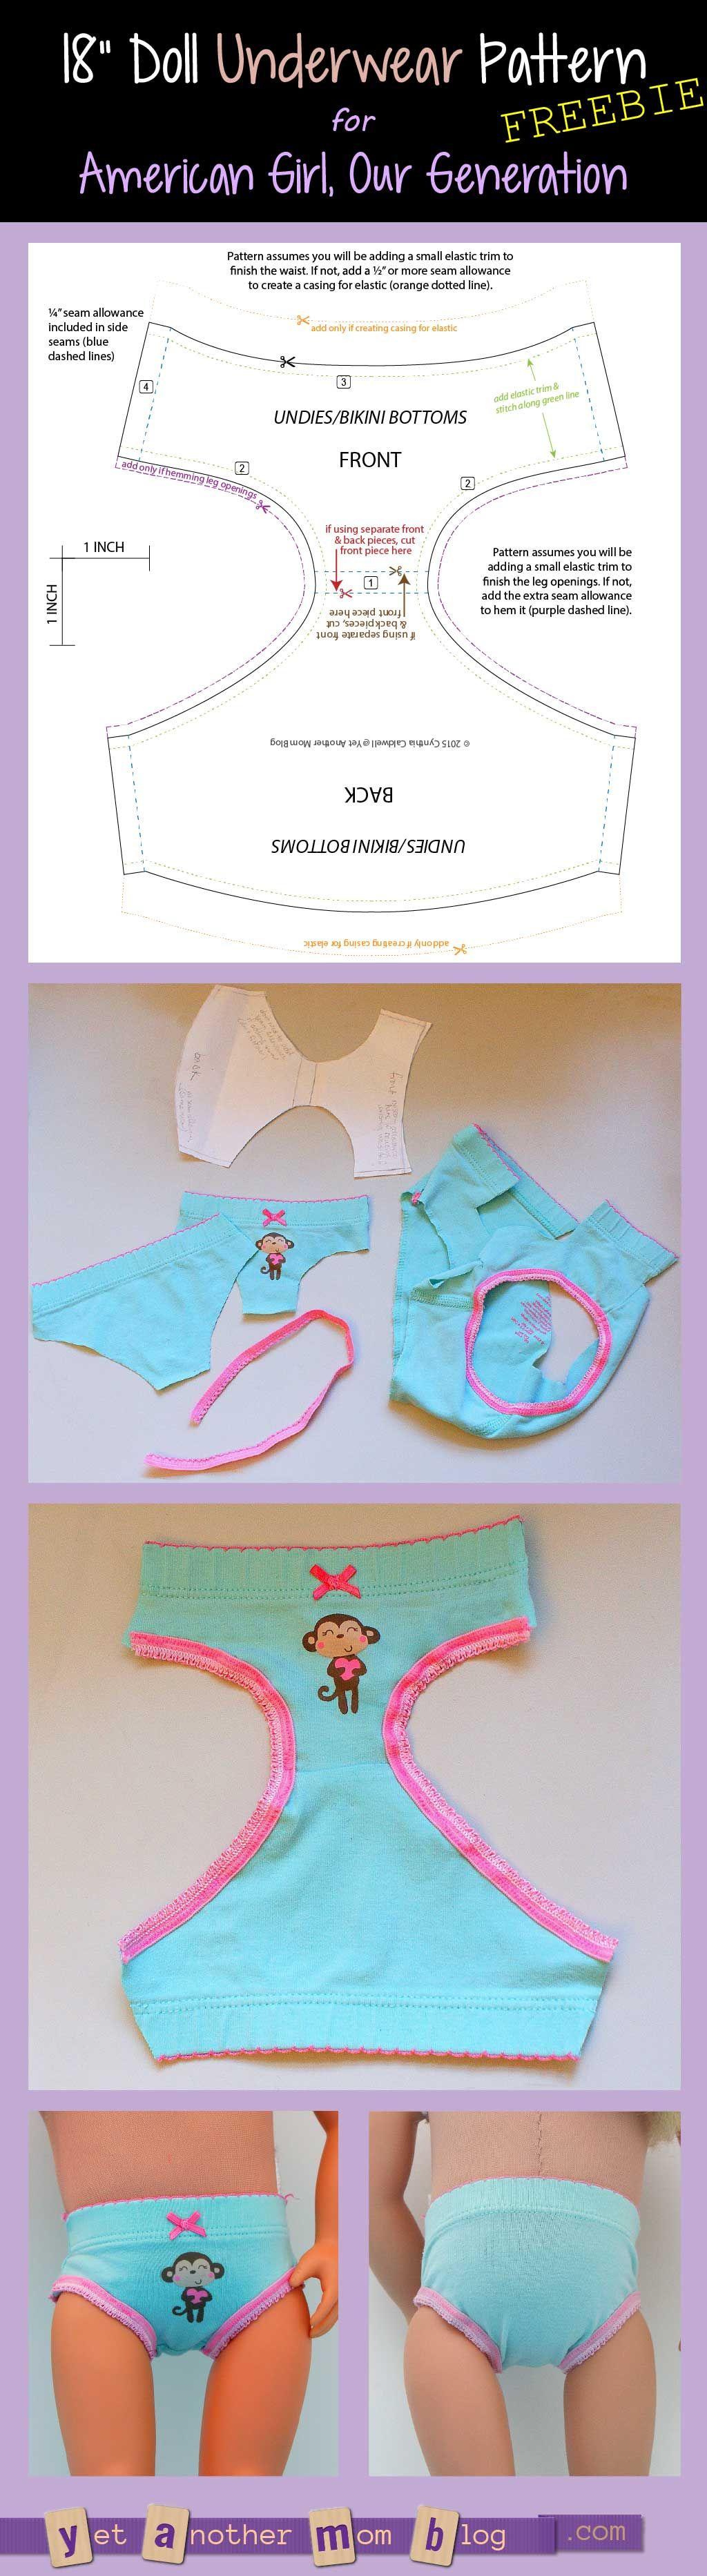 Our Generation/American Girl undies/bikini bottoms pattern freebie ...